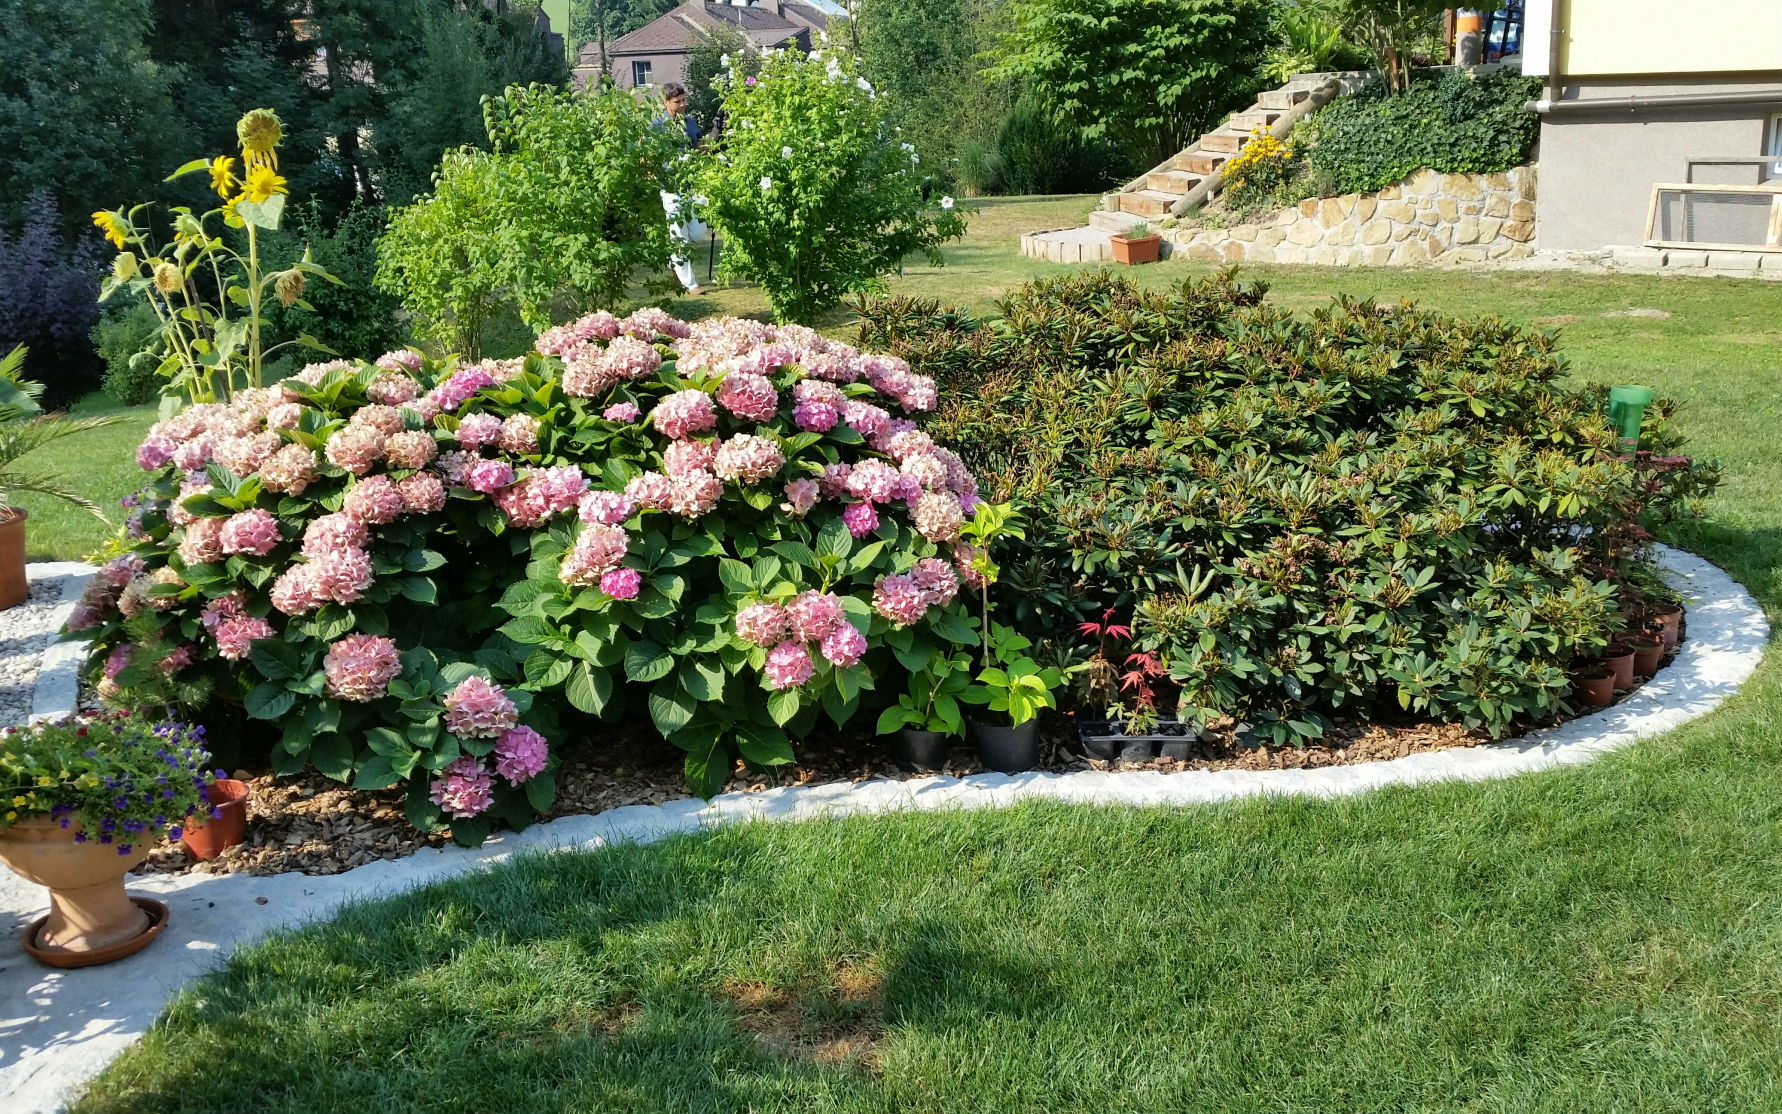 Gartengestaltung maschinenring erlauftal for Gartengestaltung 1210 wien